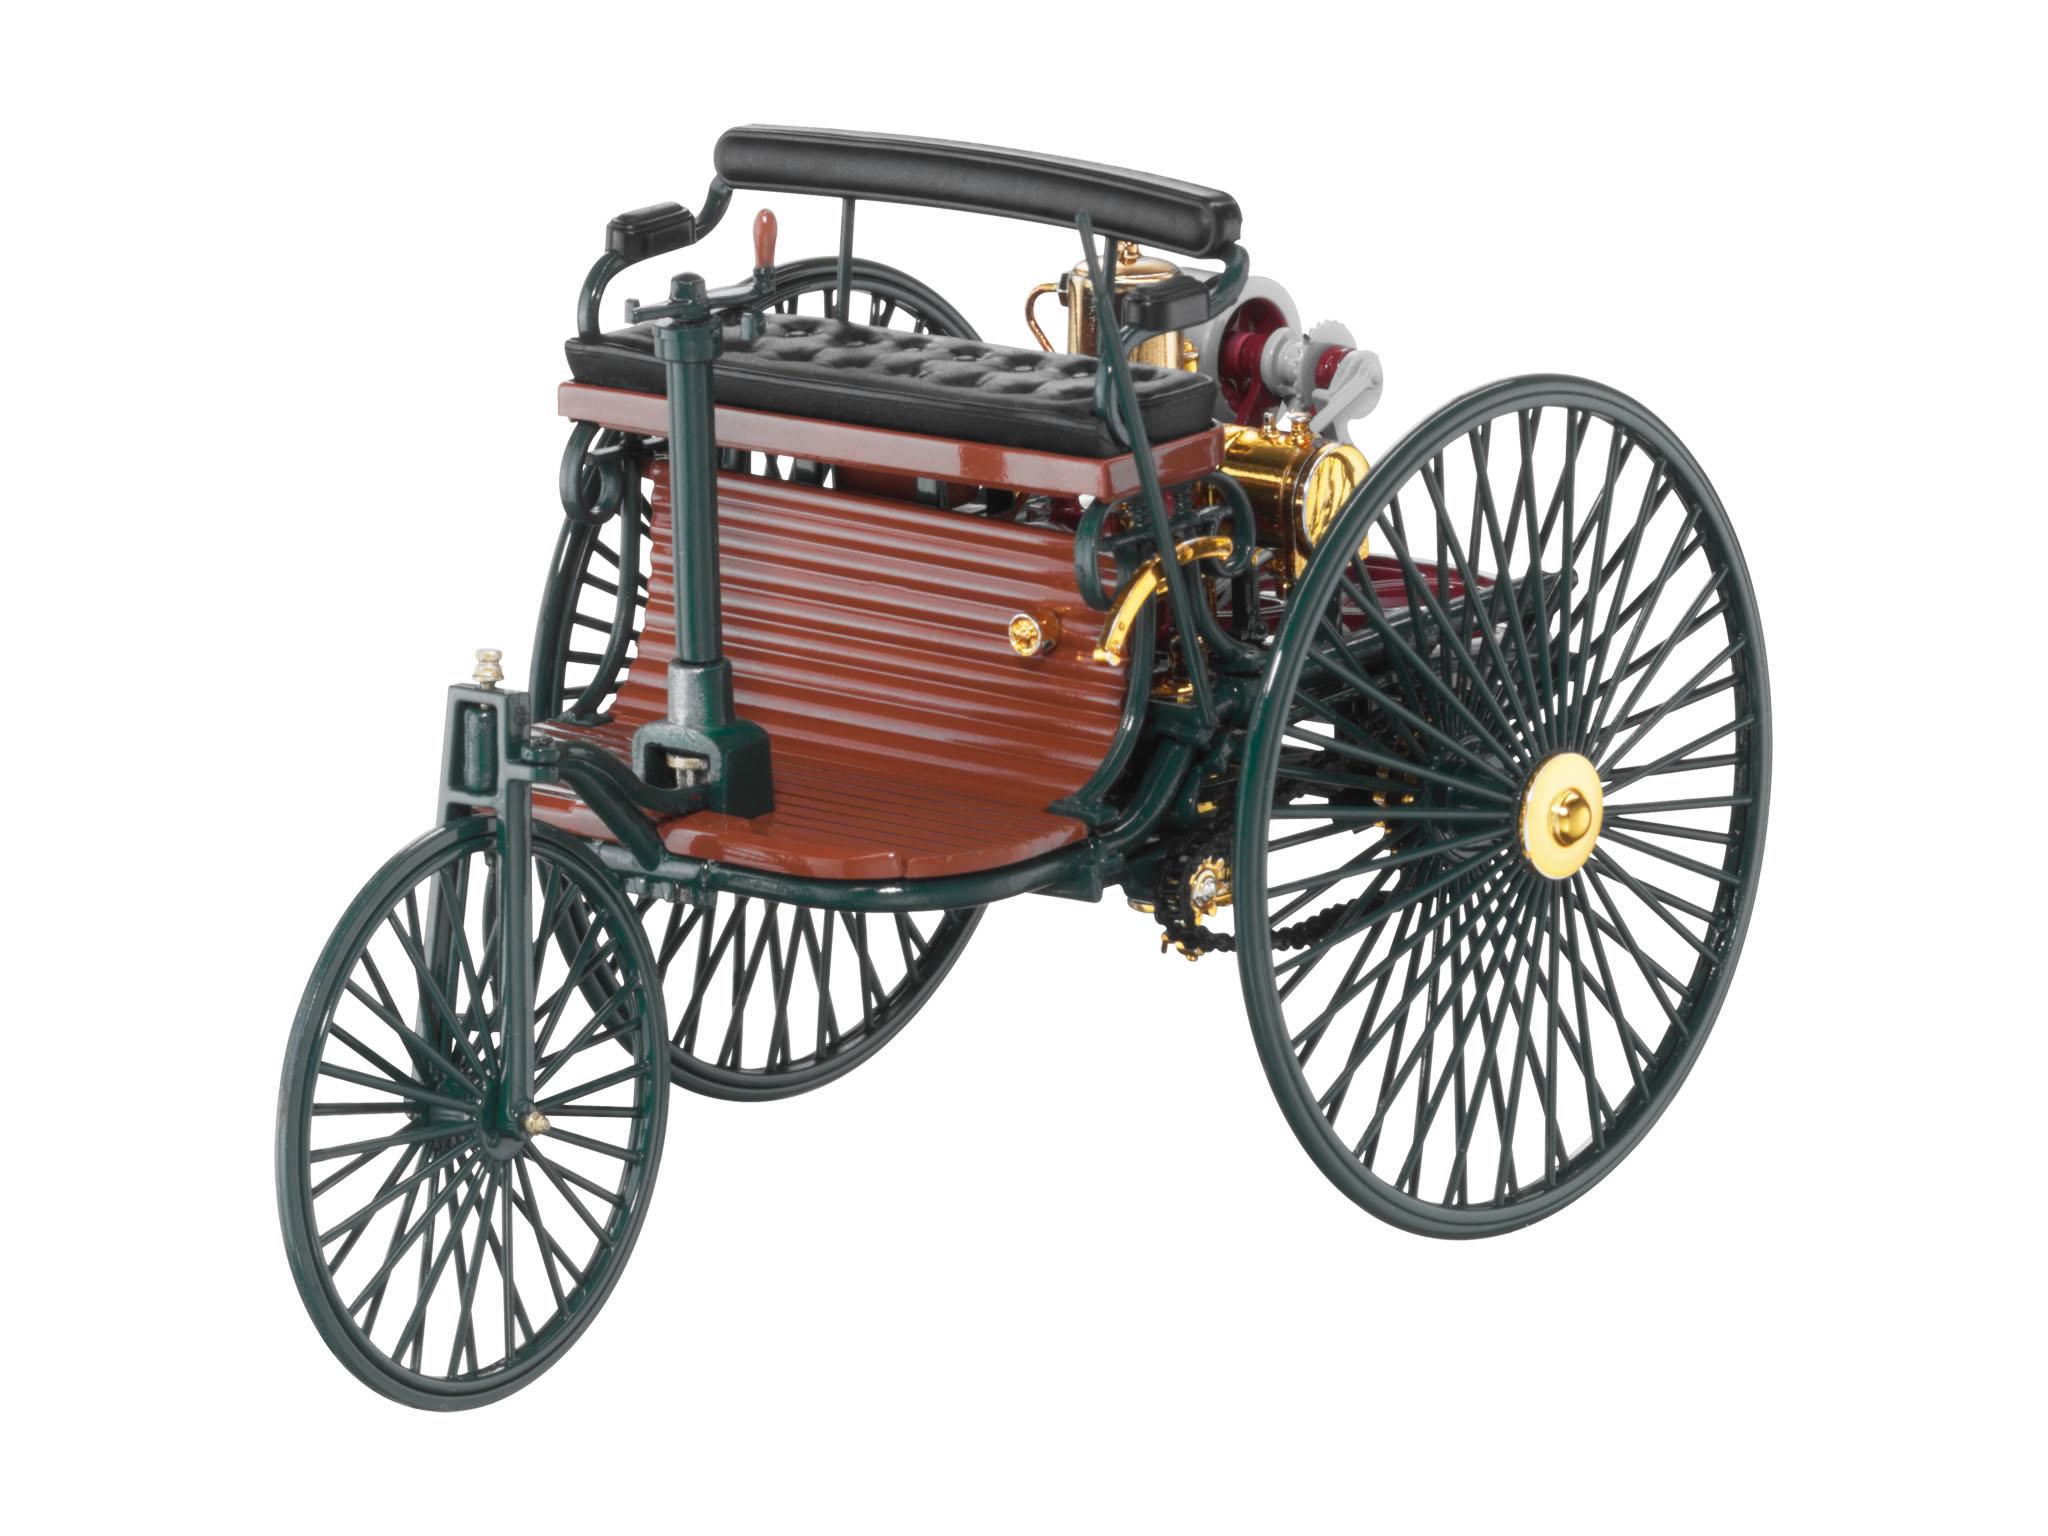 benz patent motorwagen 1886 schaalmodellen mercedes benz official online shop klantenservice. Black Bedroom Furniture Sets. Home Design Ideas